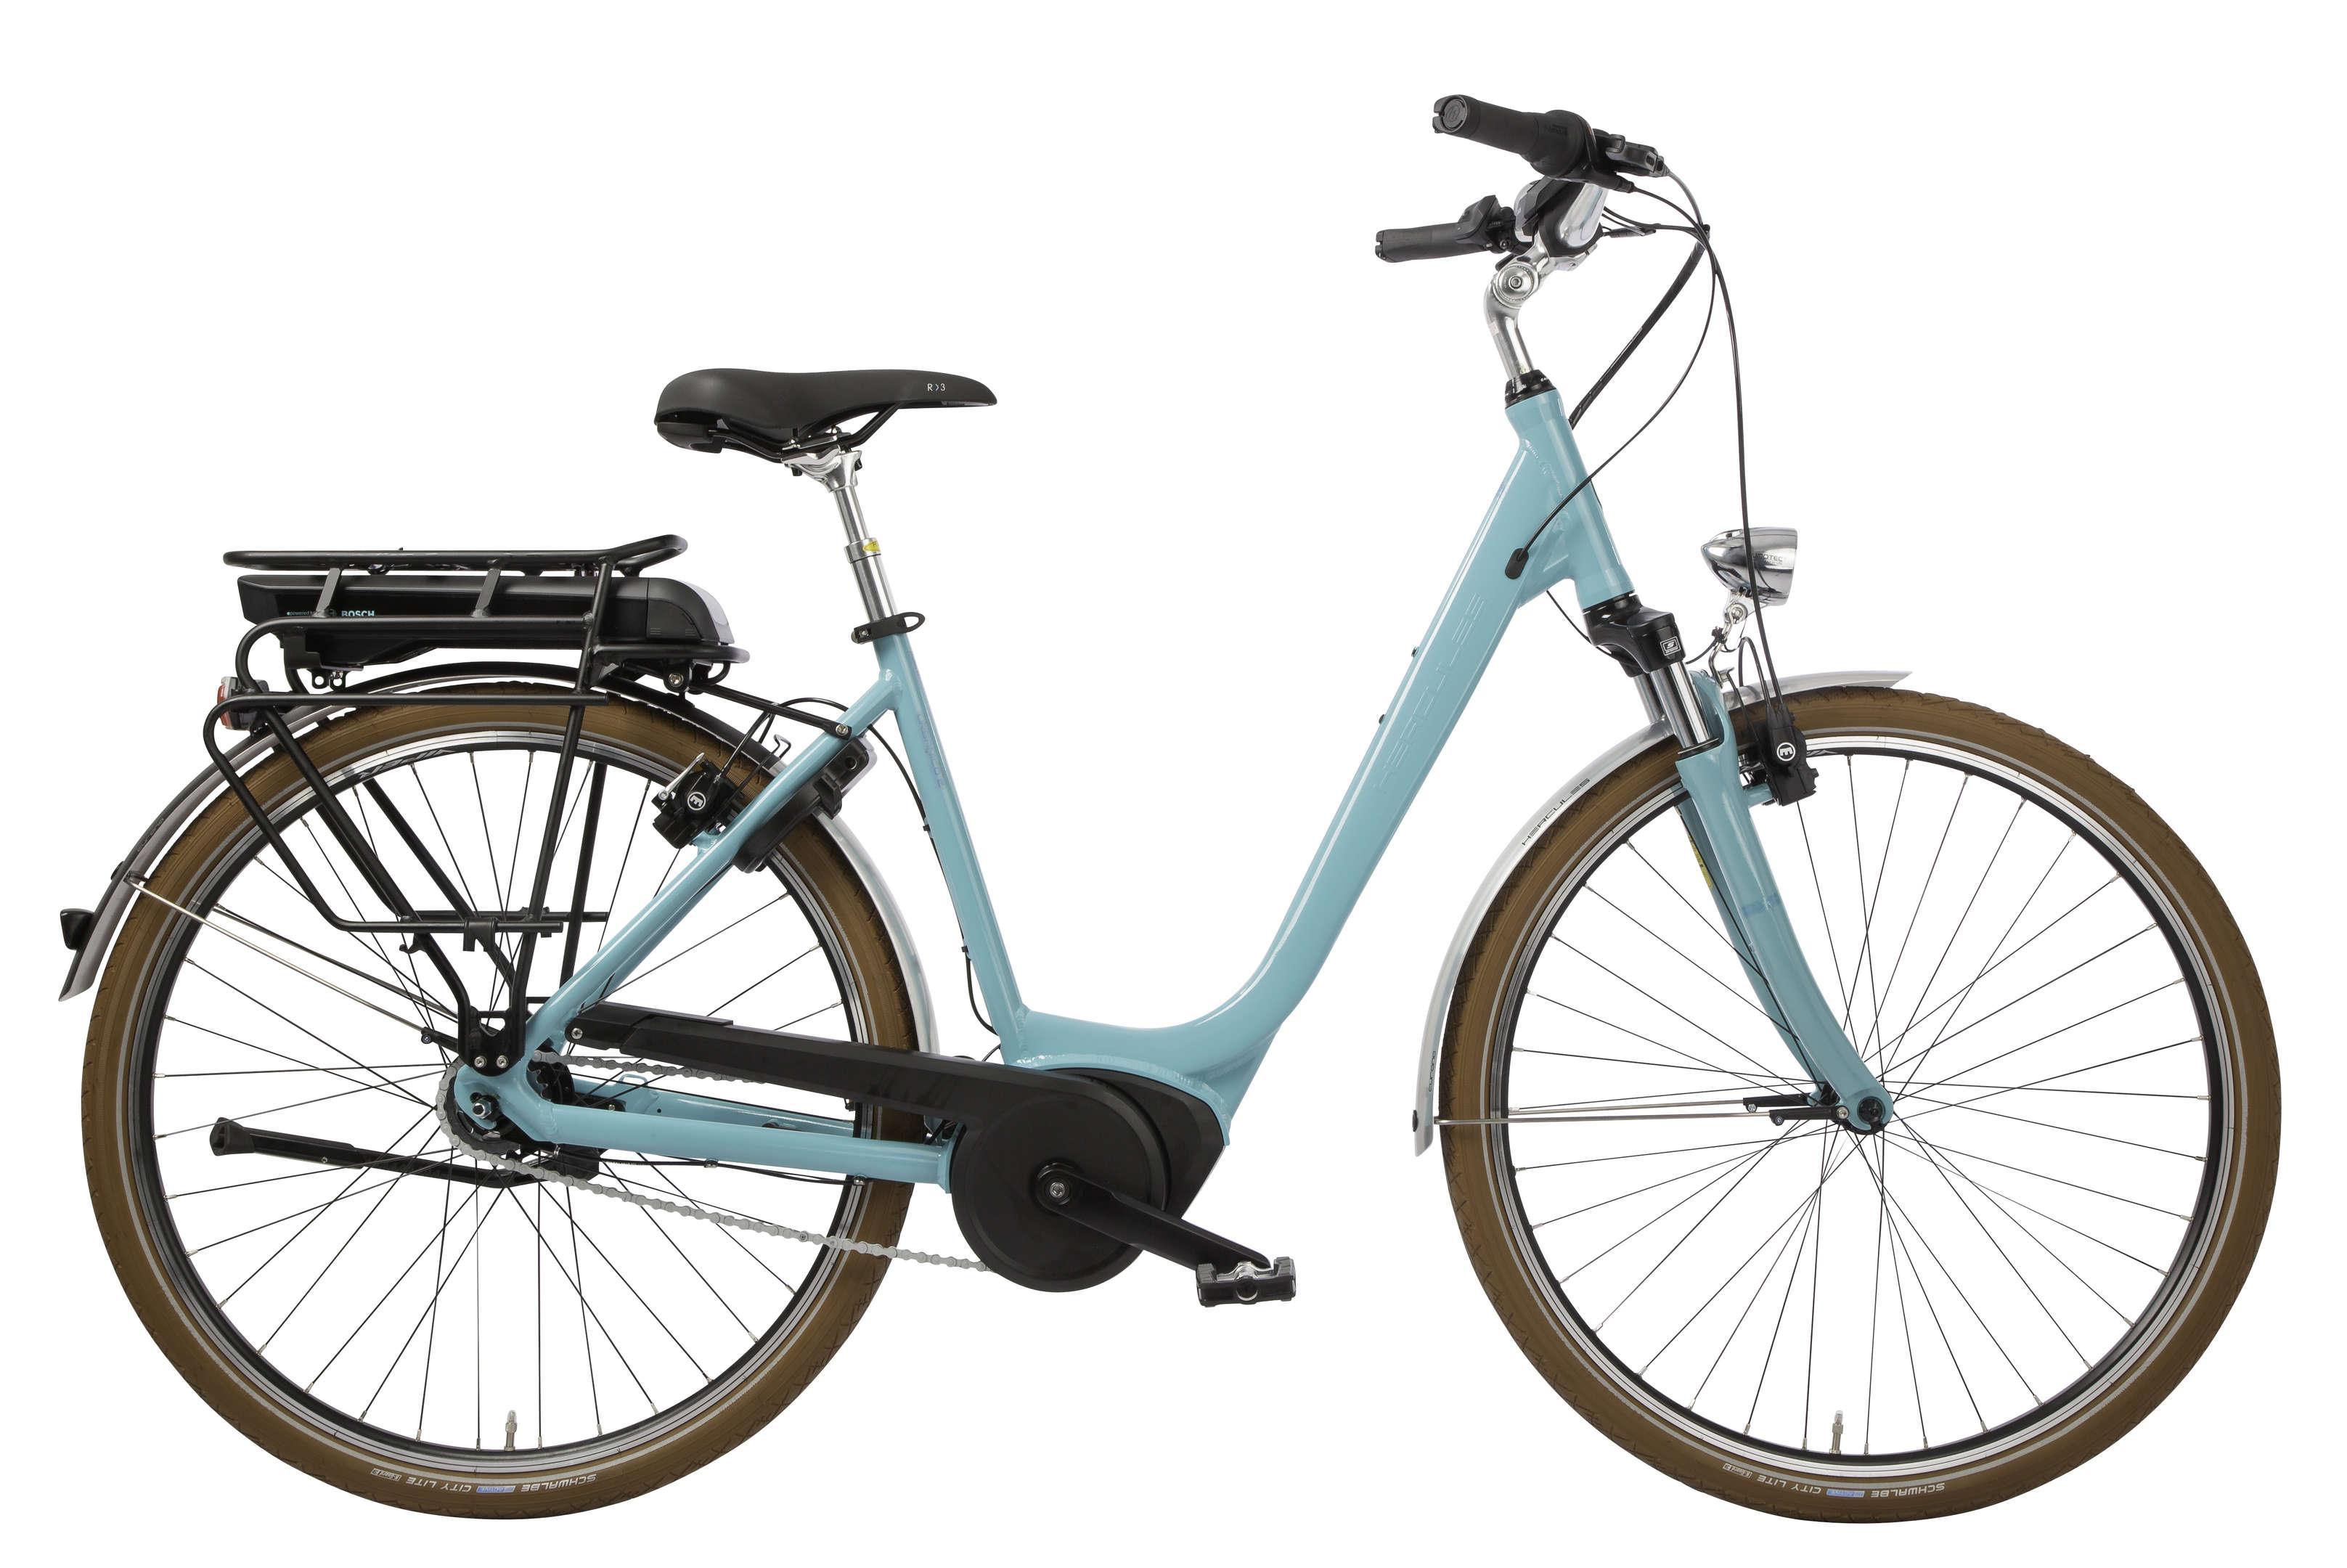 hercules e bike urbanico r8 eurorad bikeleasingeurorad. Black Bedroom Furniture Sets. Home Design Ideas